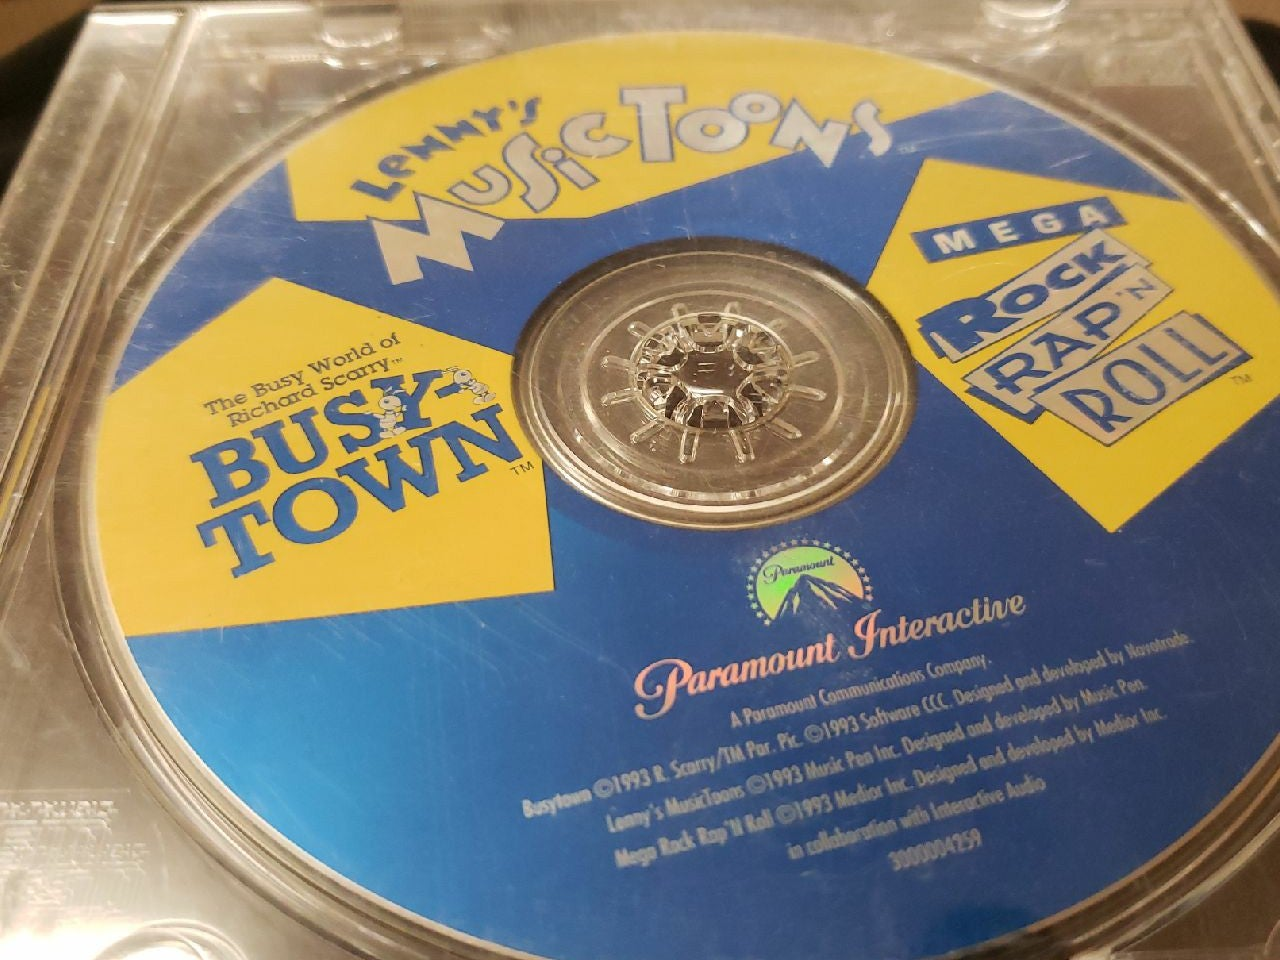 Lenny music tools cd